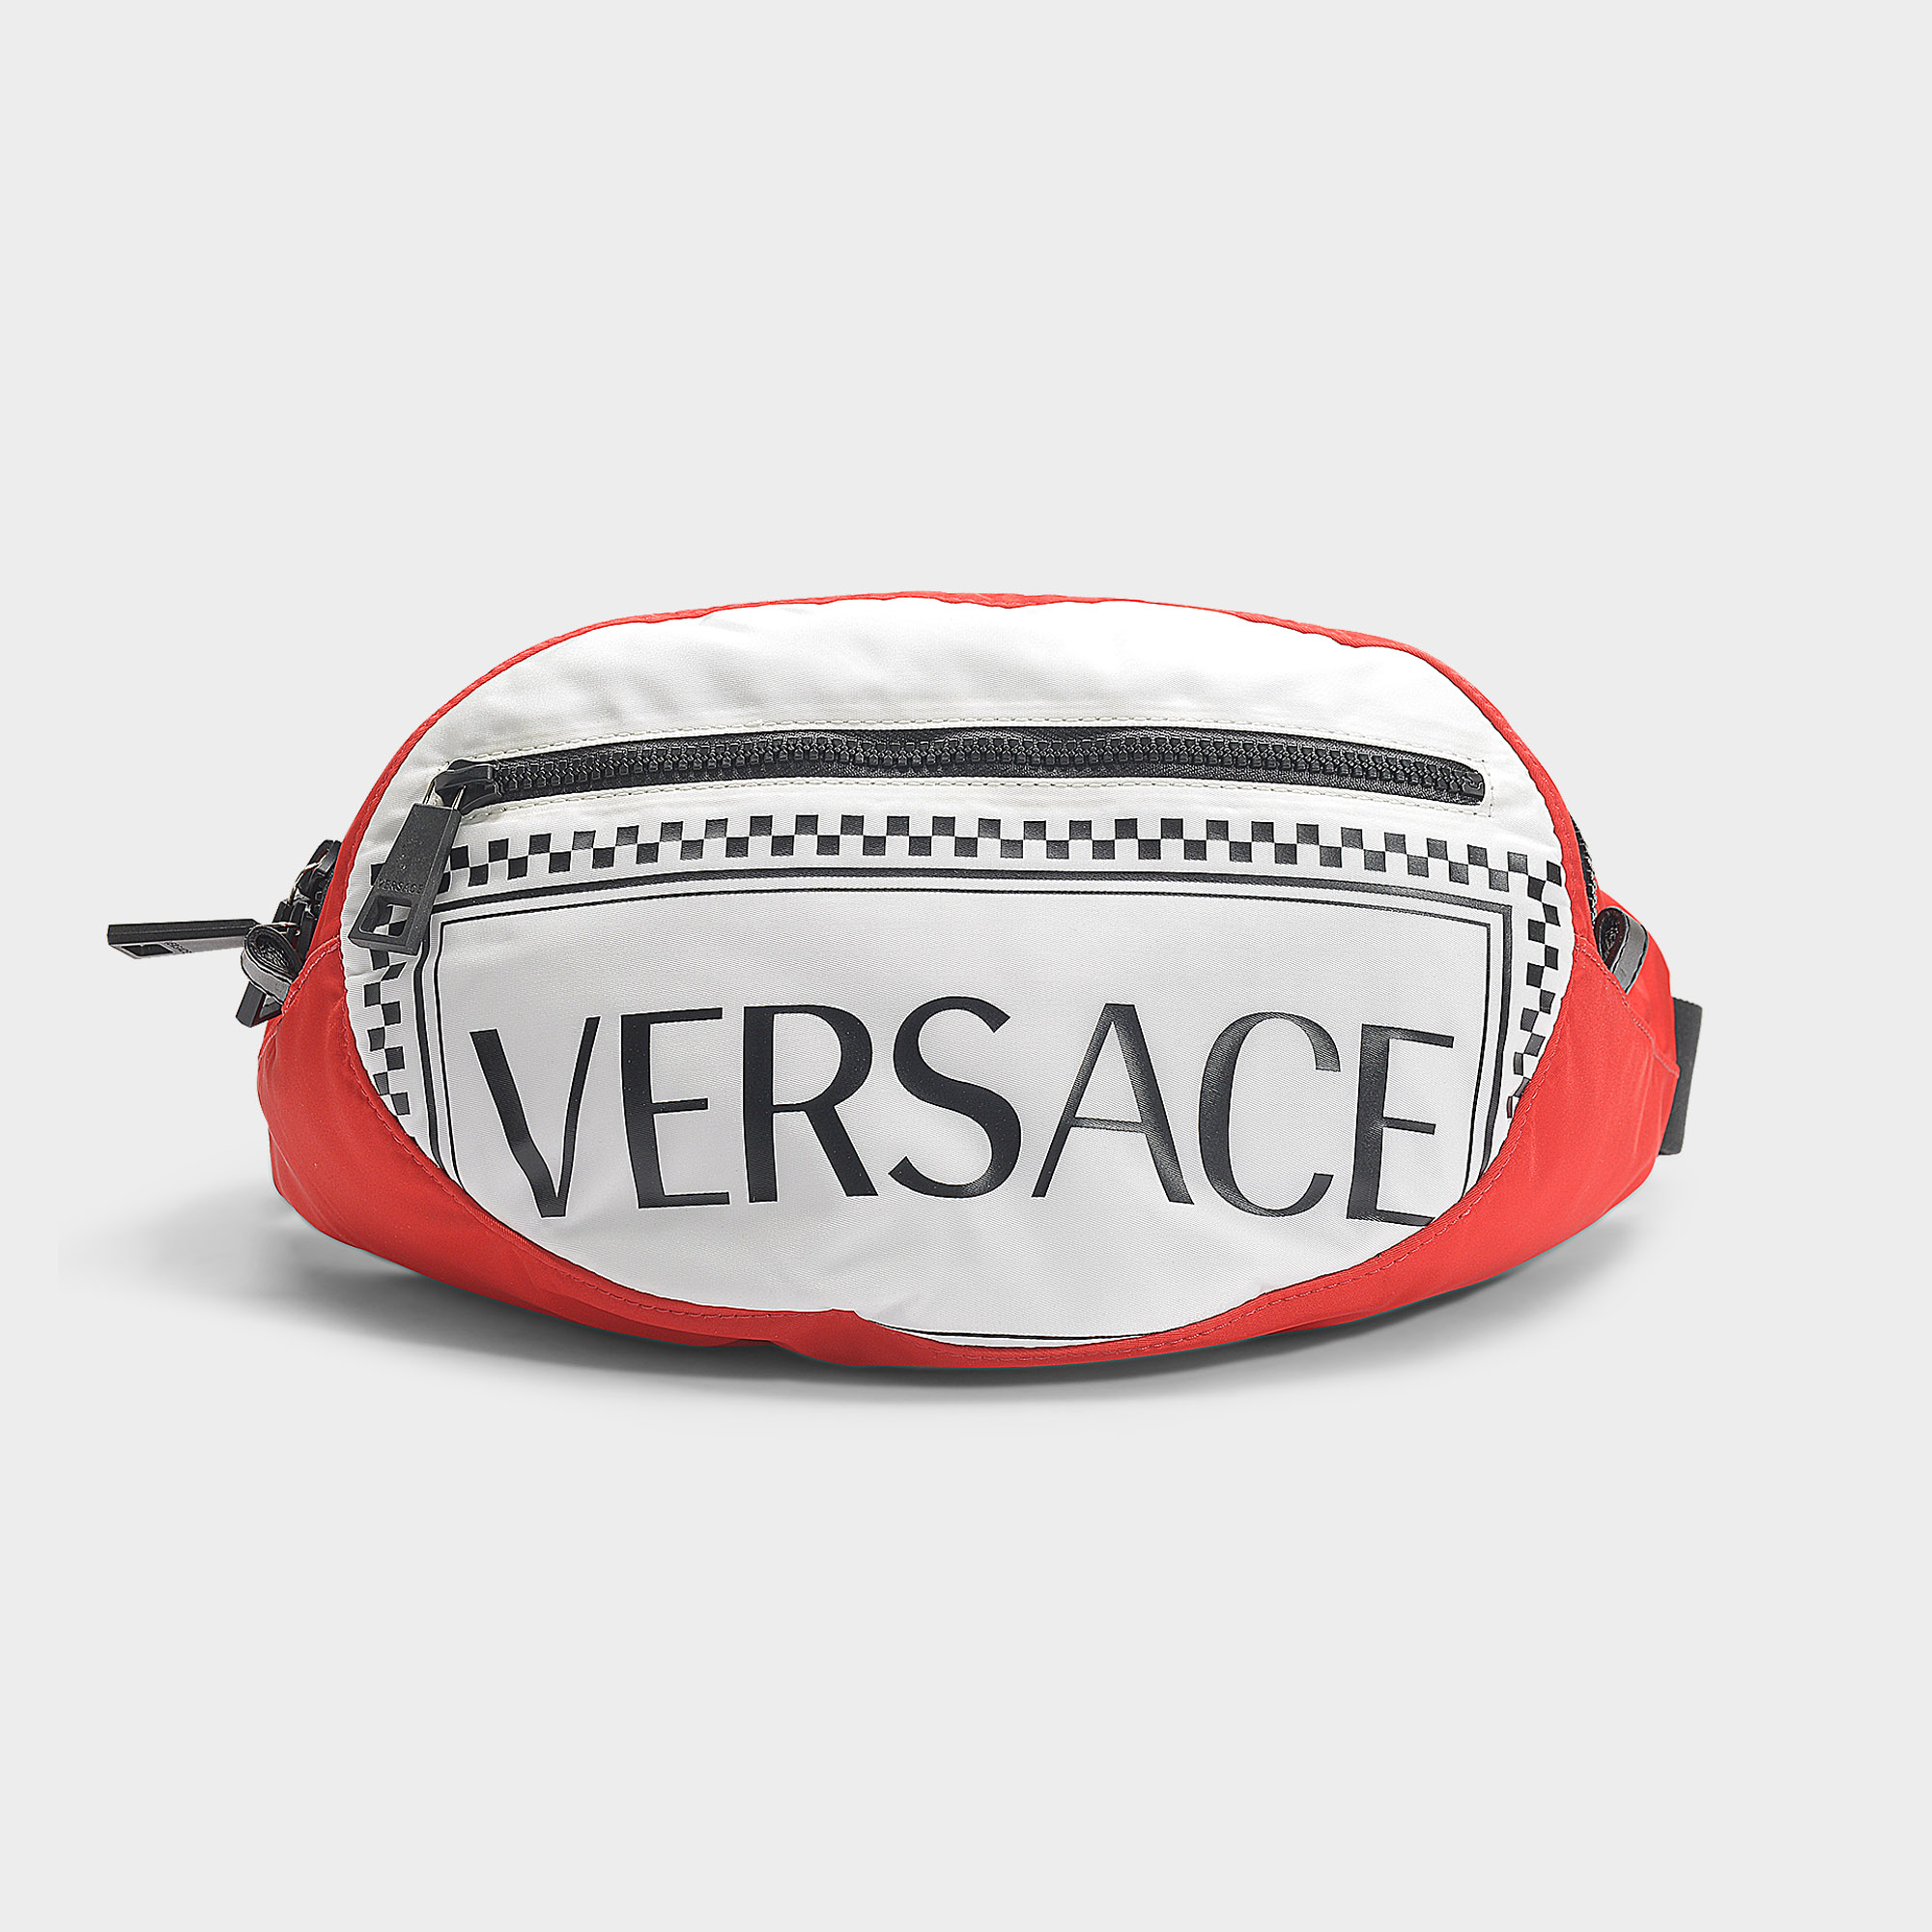 67085c0d Versace   90's Vintage Logo Oval Belt Bag In Black, Red And White Nylon